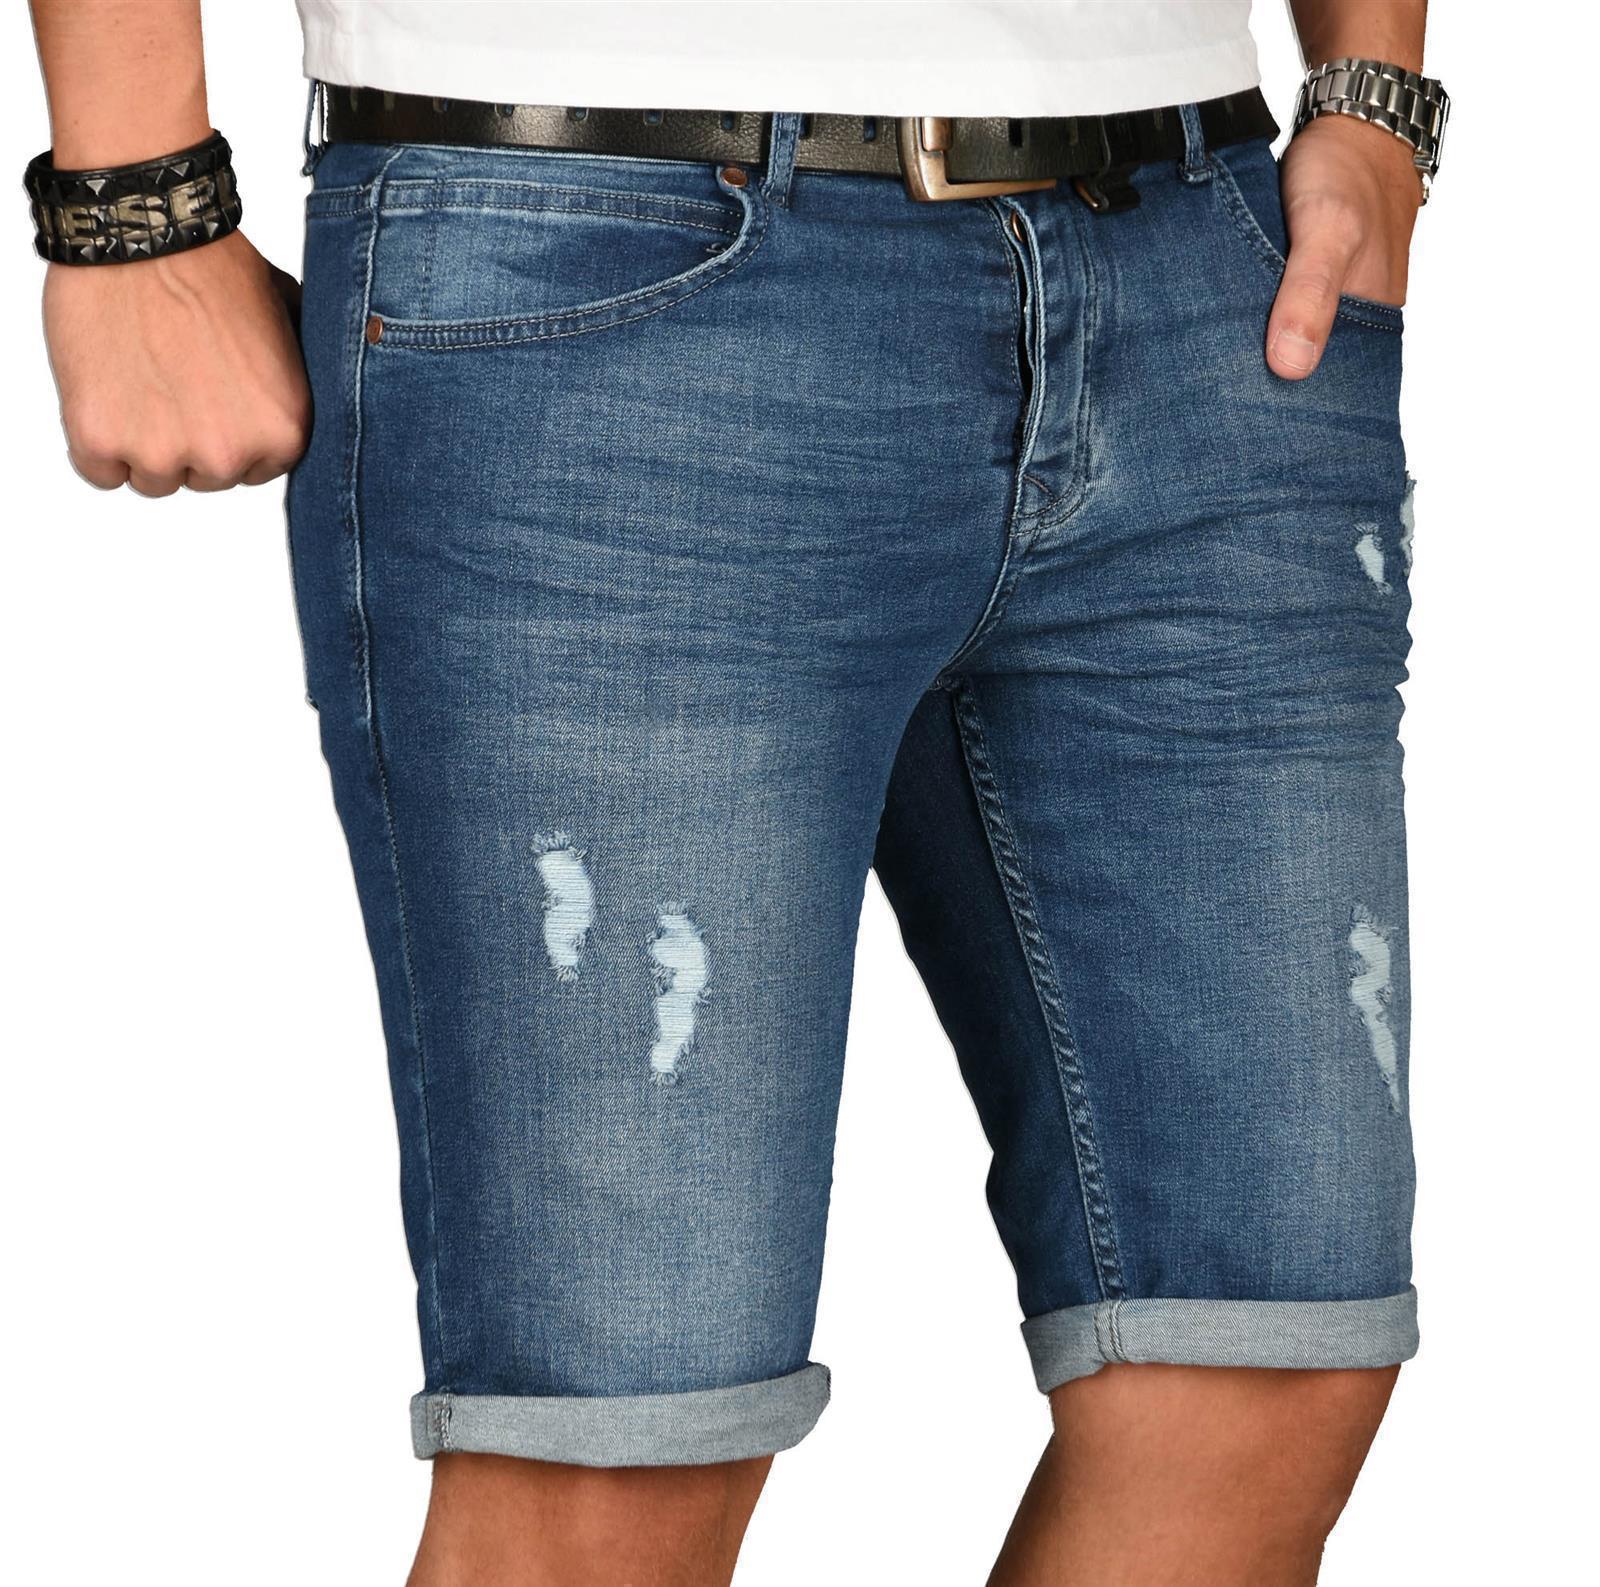 A-Salvarini-Herren-Designer-Jeans-Short-kurze-Hose-Slim-Sommer-Shorts-Washed Indexbild 31